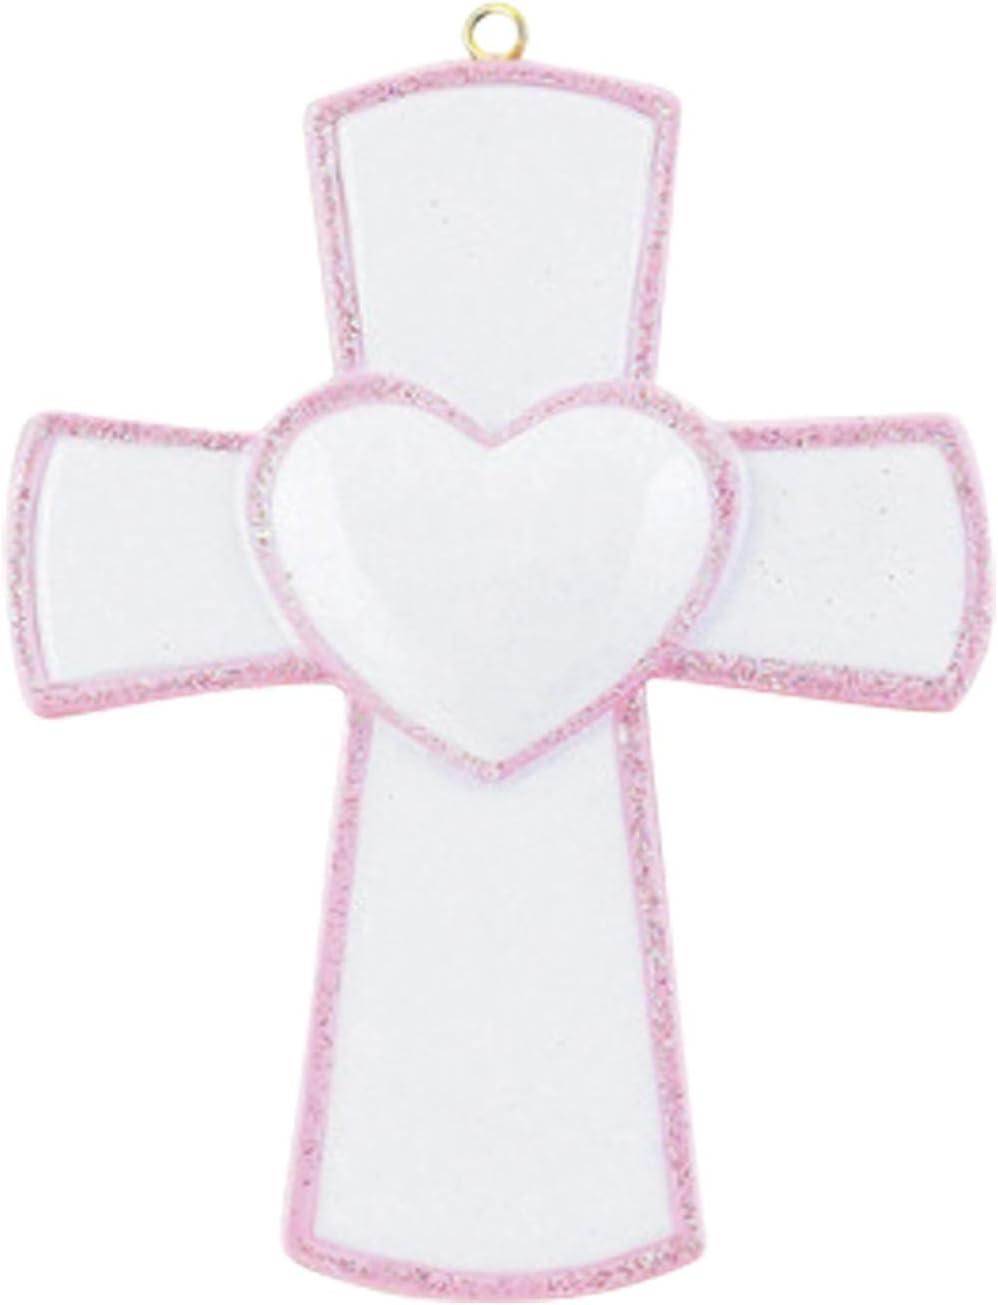 Christmas 2020 Christian Amazon.com: Personalized Cross Christmas Tree Ornament 2020